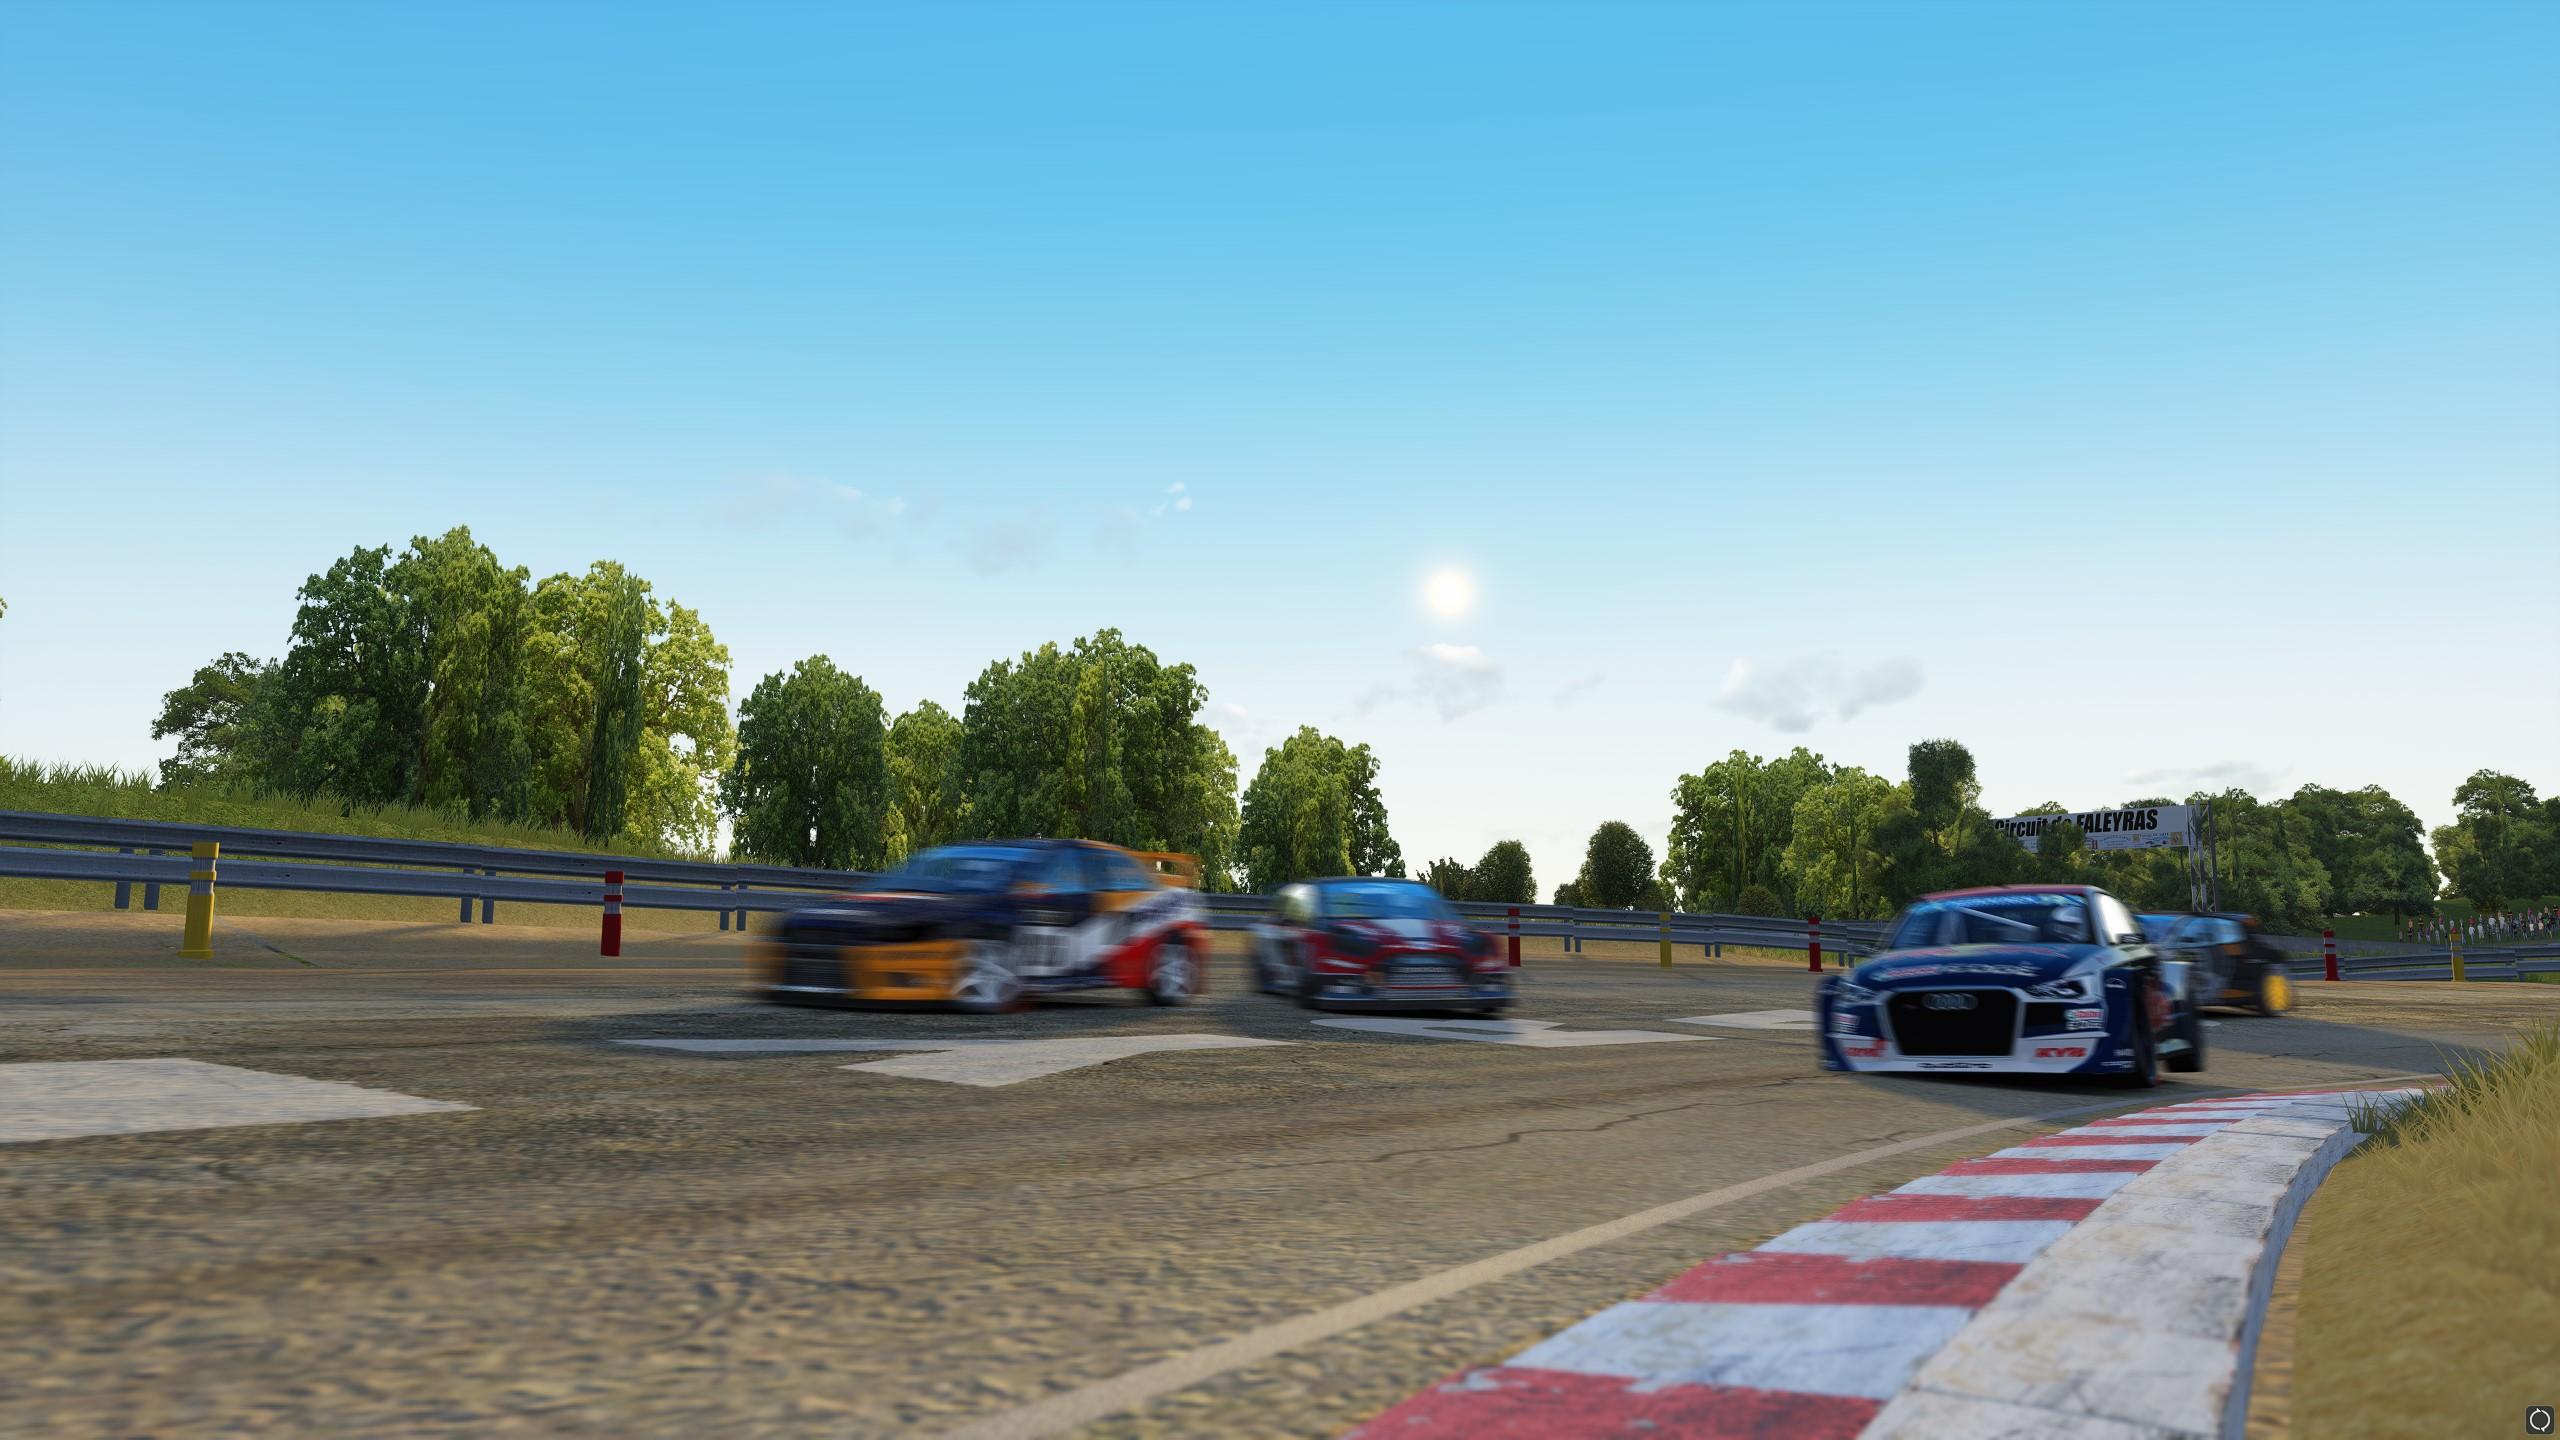 Screenshot_rallycross_renault_clio_faleyras_track_25-10-120-19-51-36.jpg